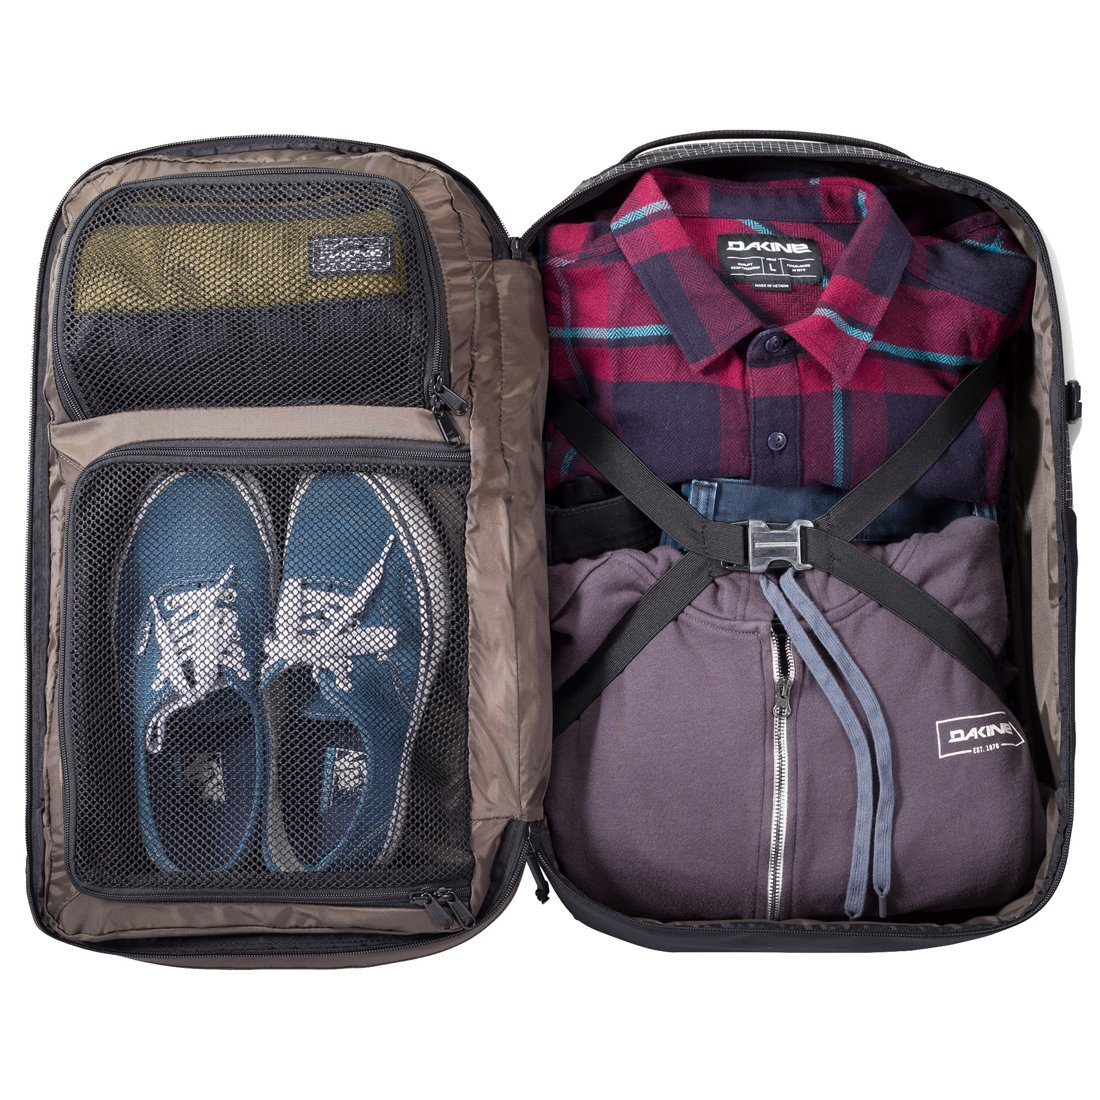 f0d4c133bdc2d Dakine Packs   Bags Split Adventure Rucksack 55 cm - koffer-direkt.de